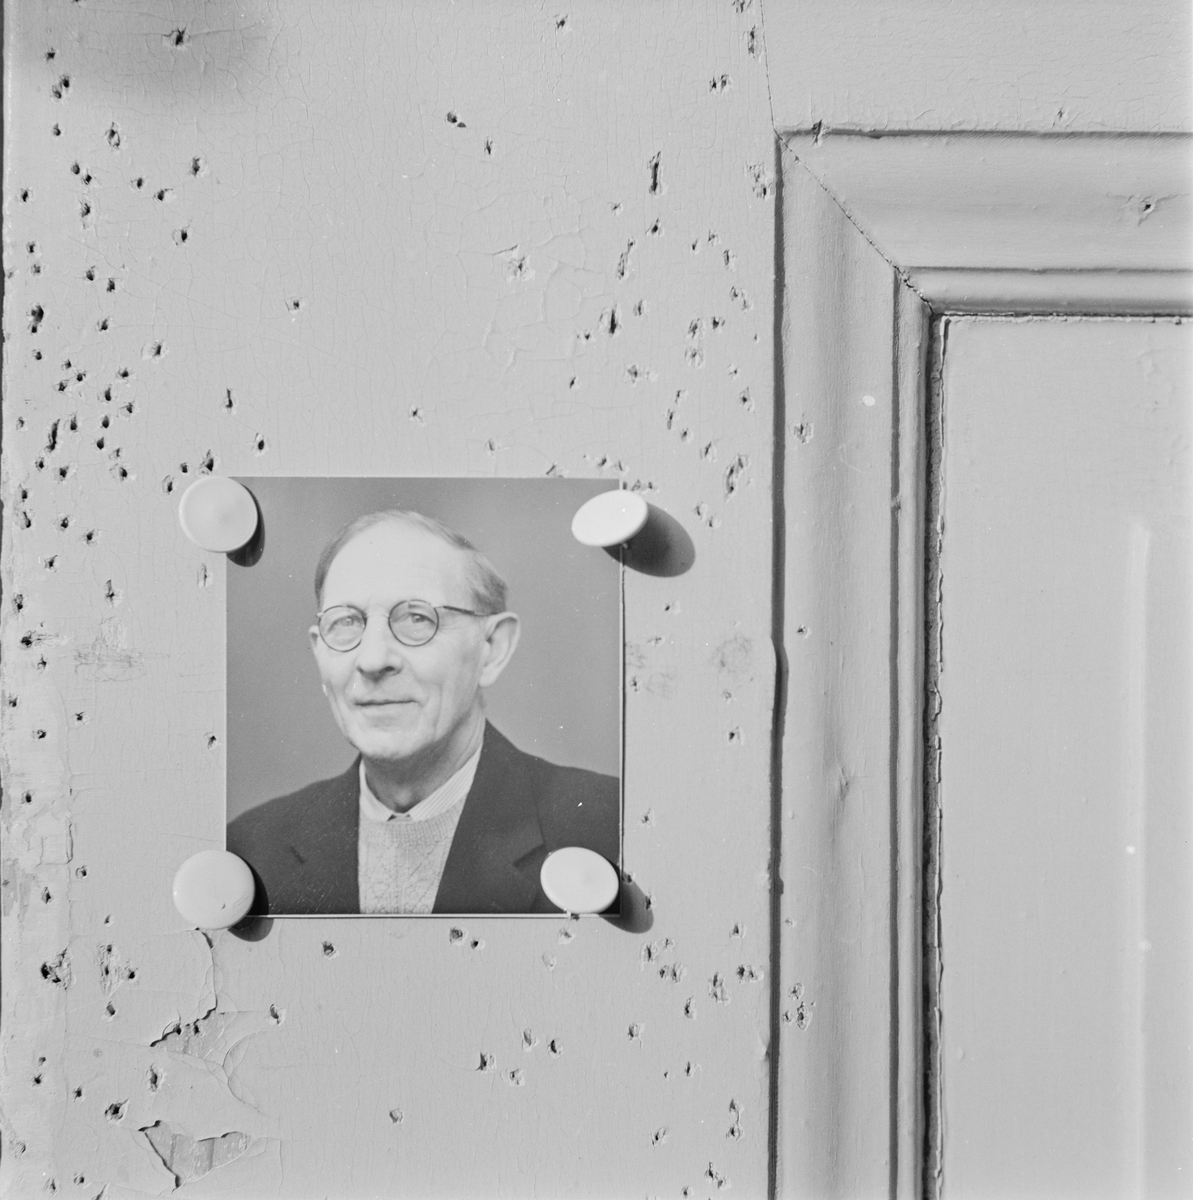 Reprofotografi - Artur Johansson, Uppland 1960